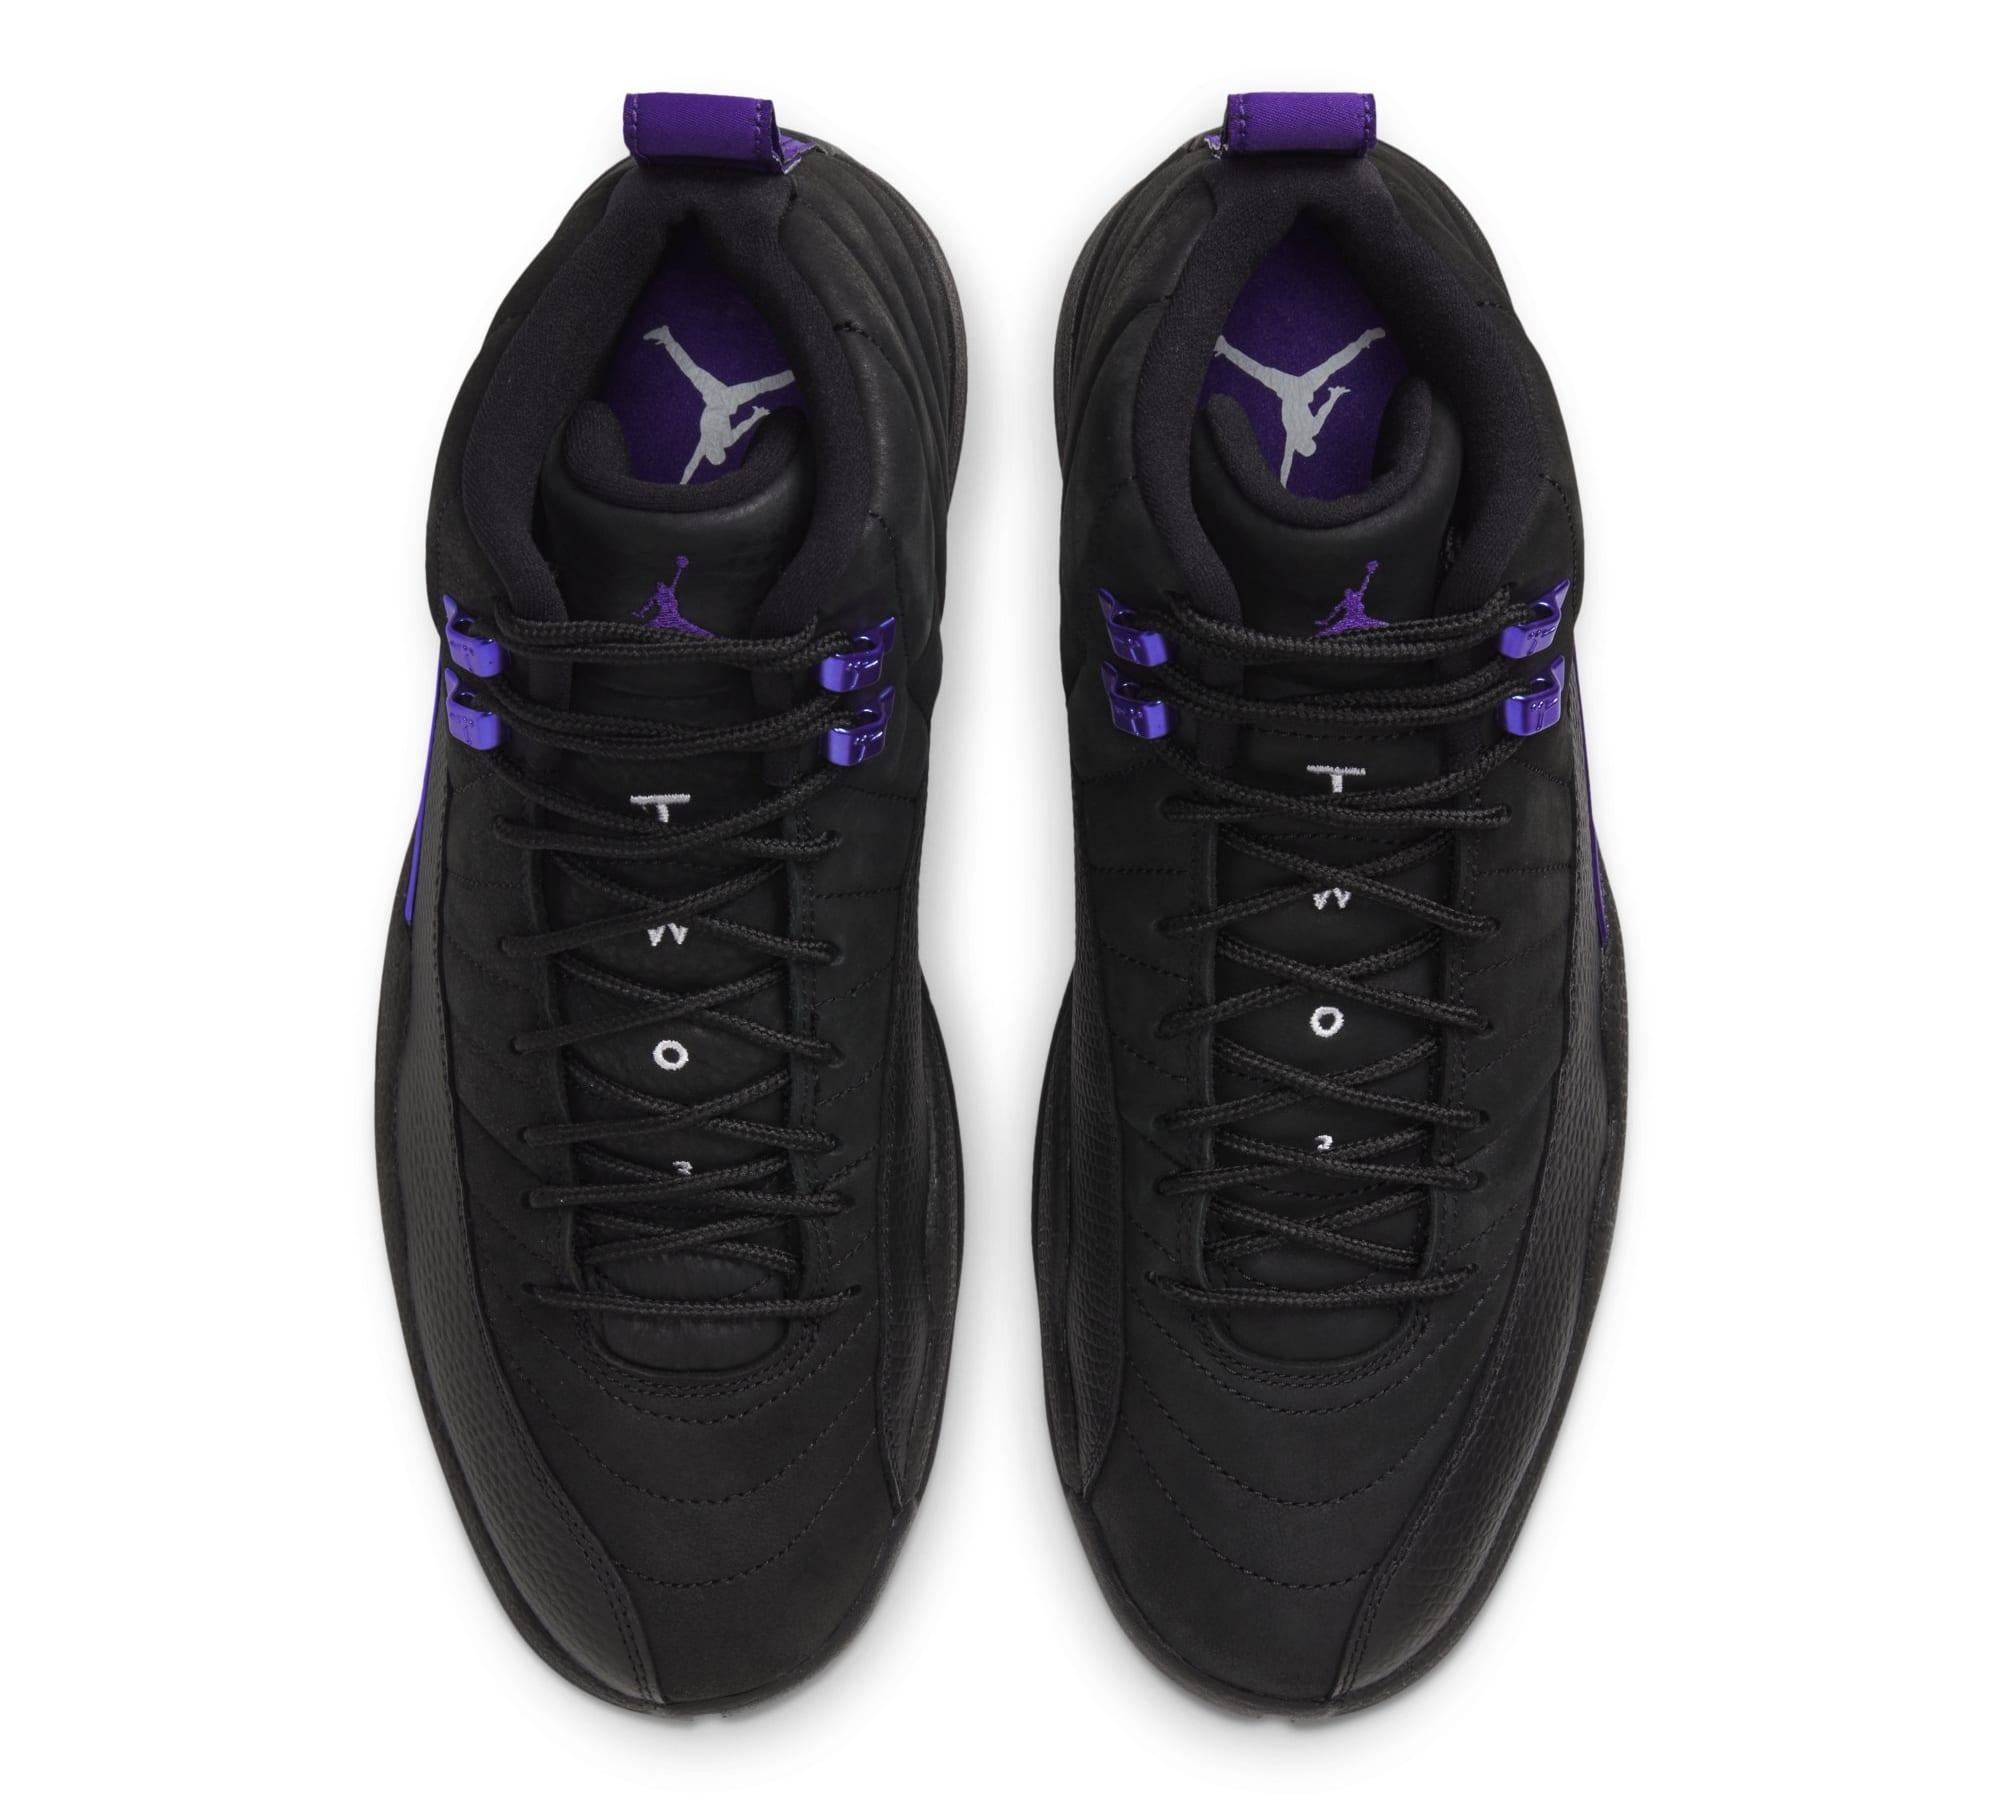 Air Jordan 12 Retro 'Black/Black/Dark Concord' CT8013-005 (Pair)